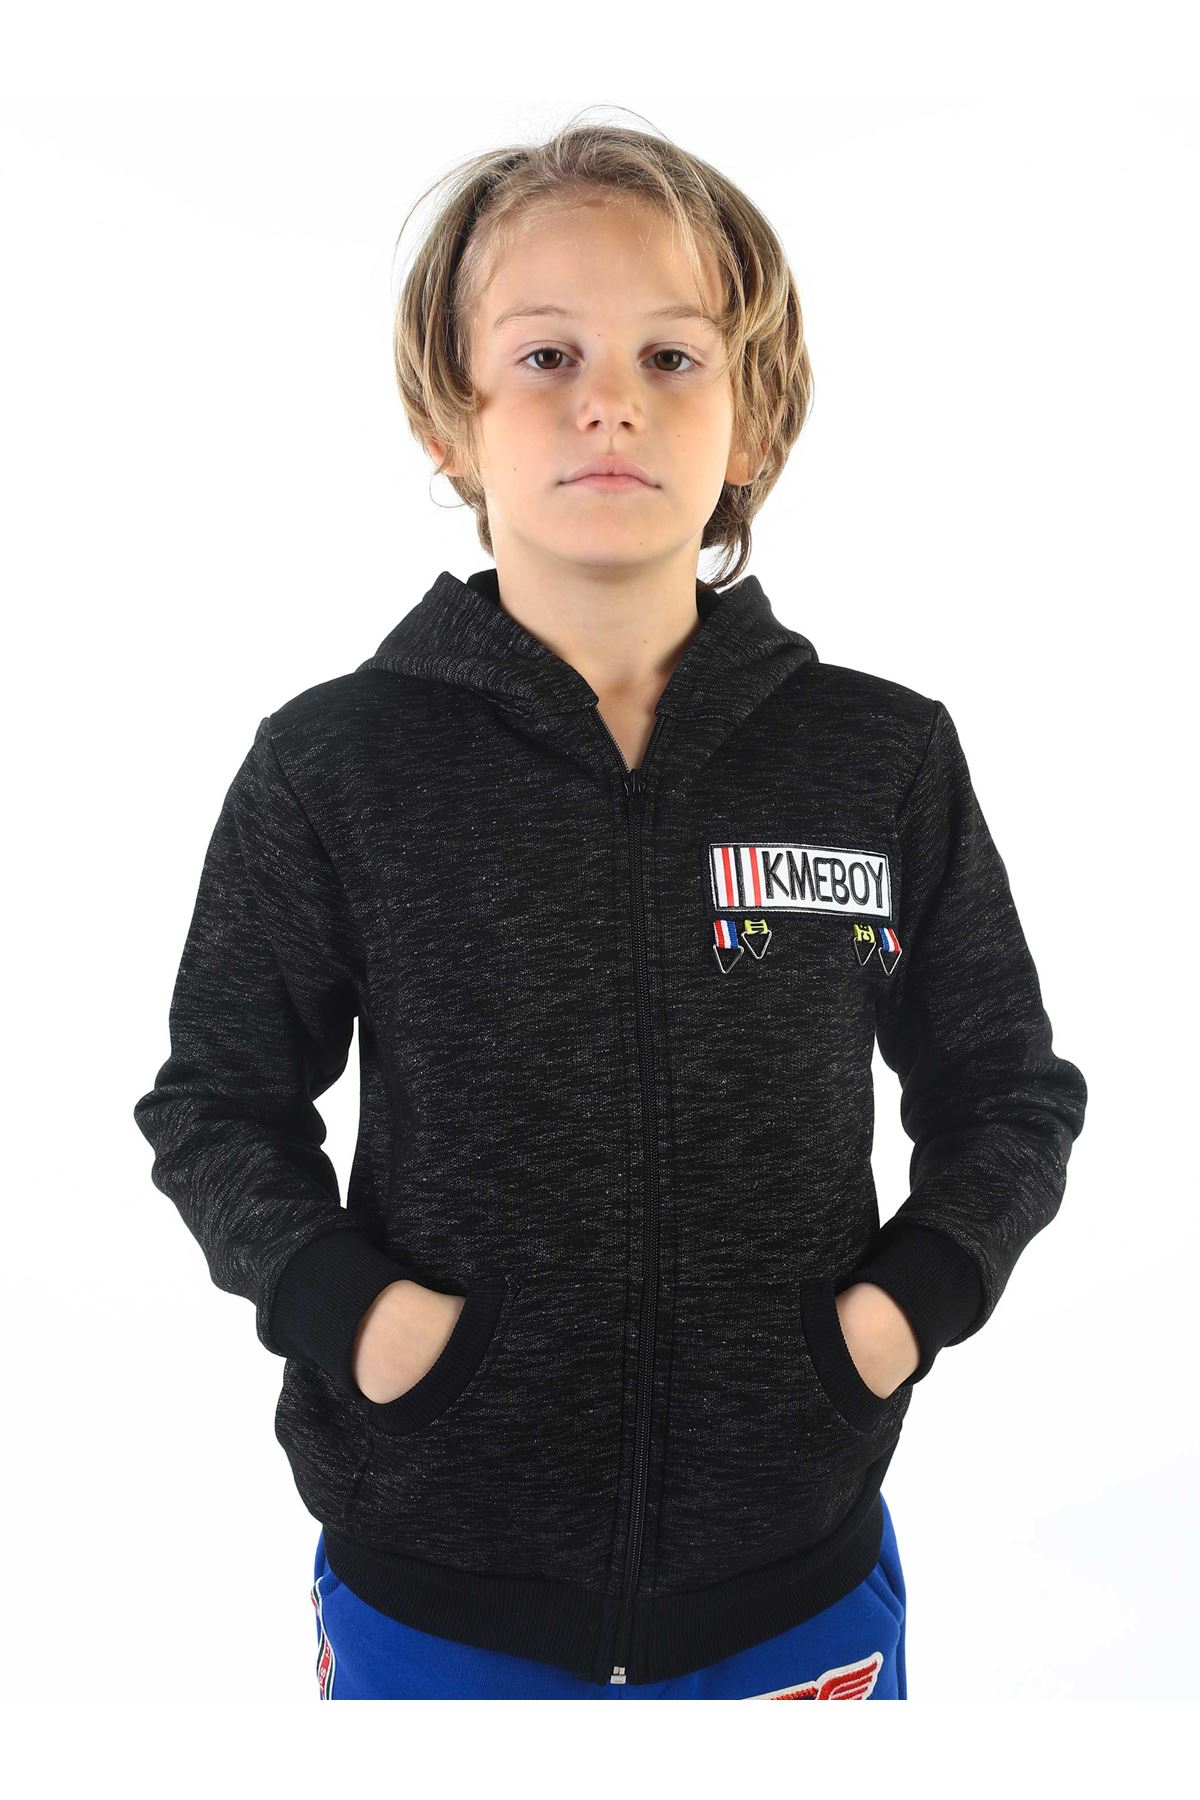 Black Winter Male Child Jacket